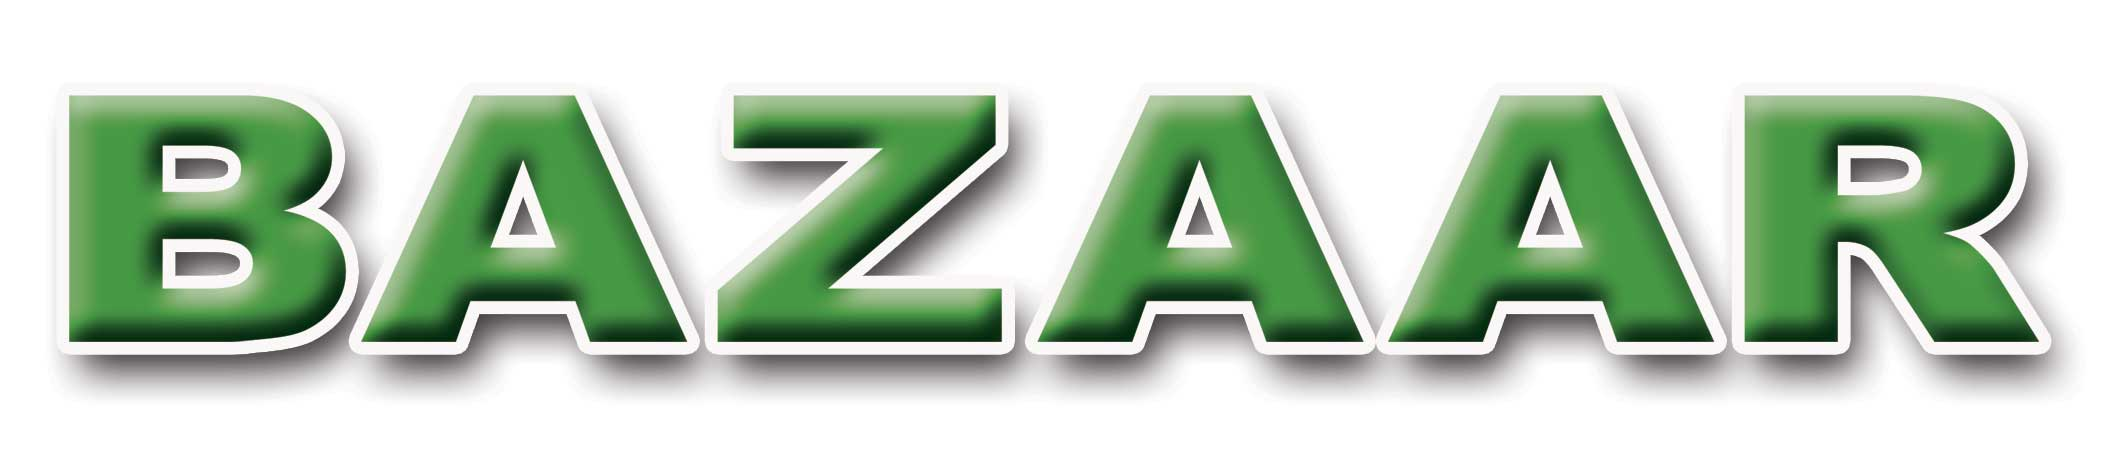 bazaar weekly